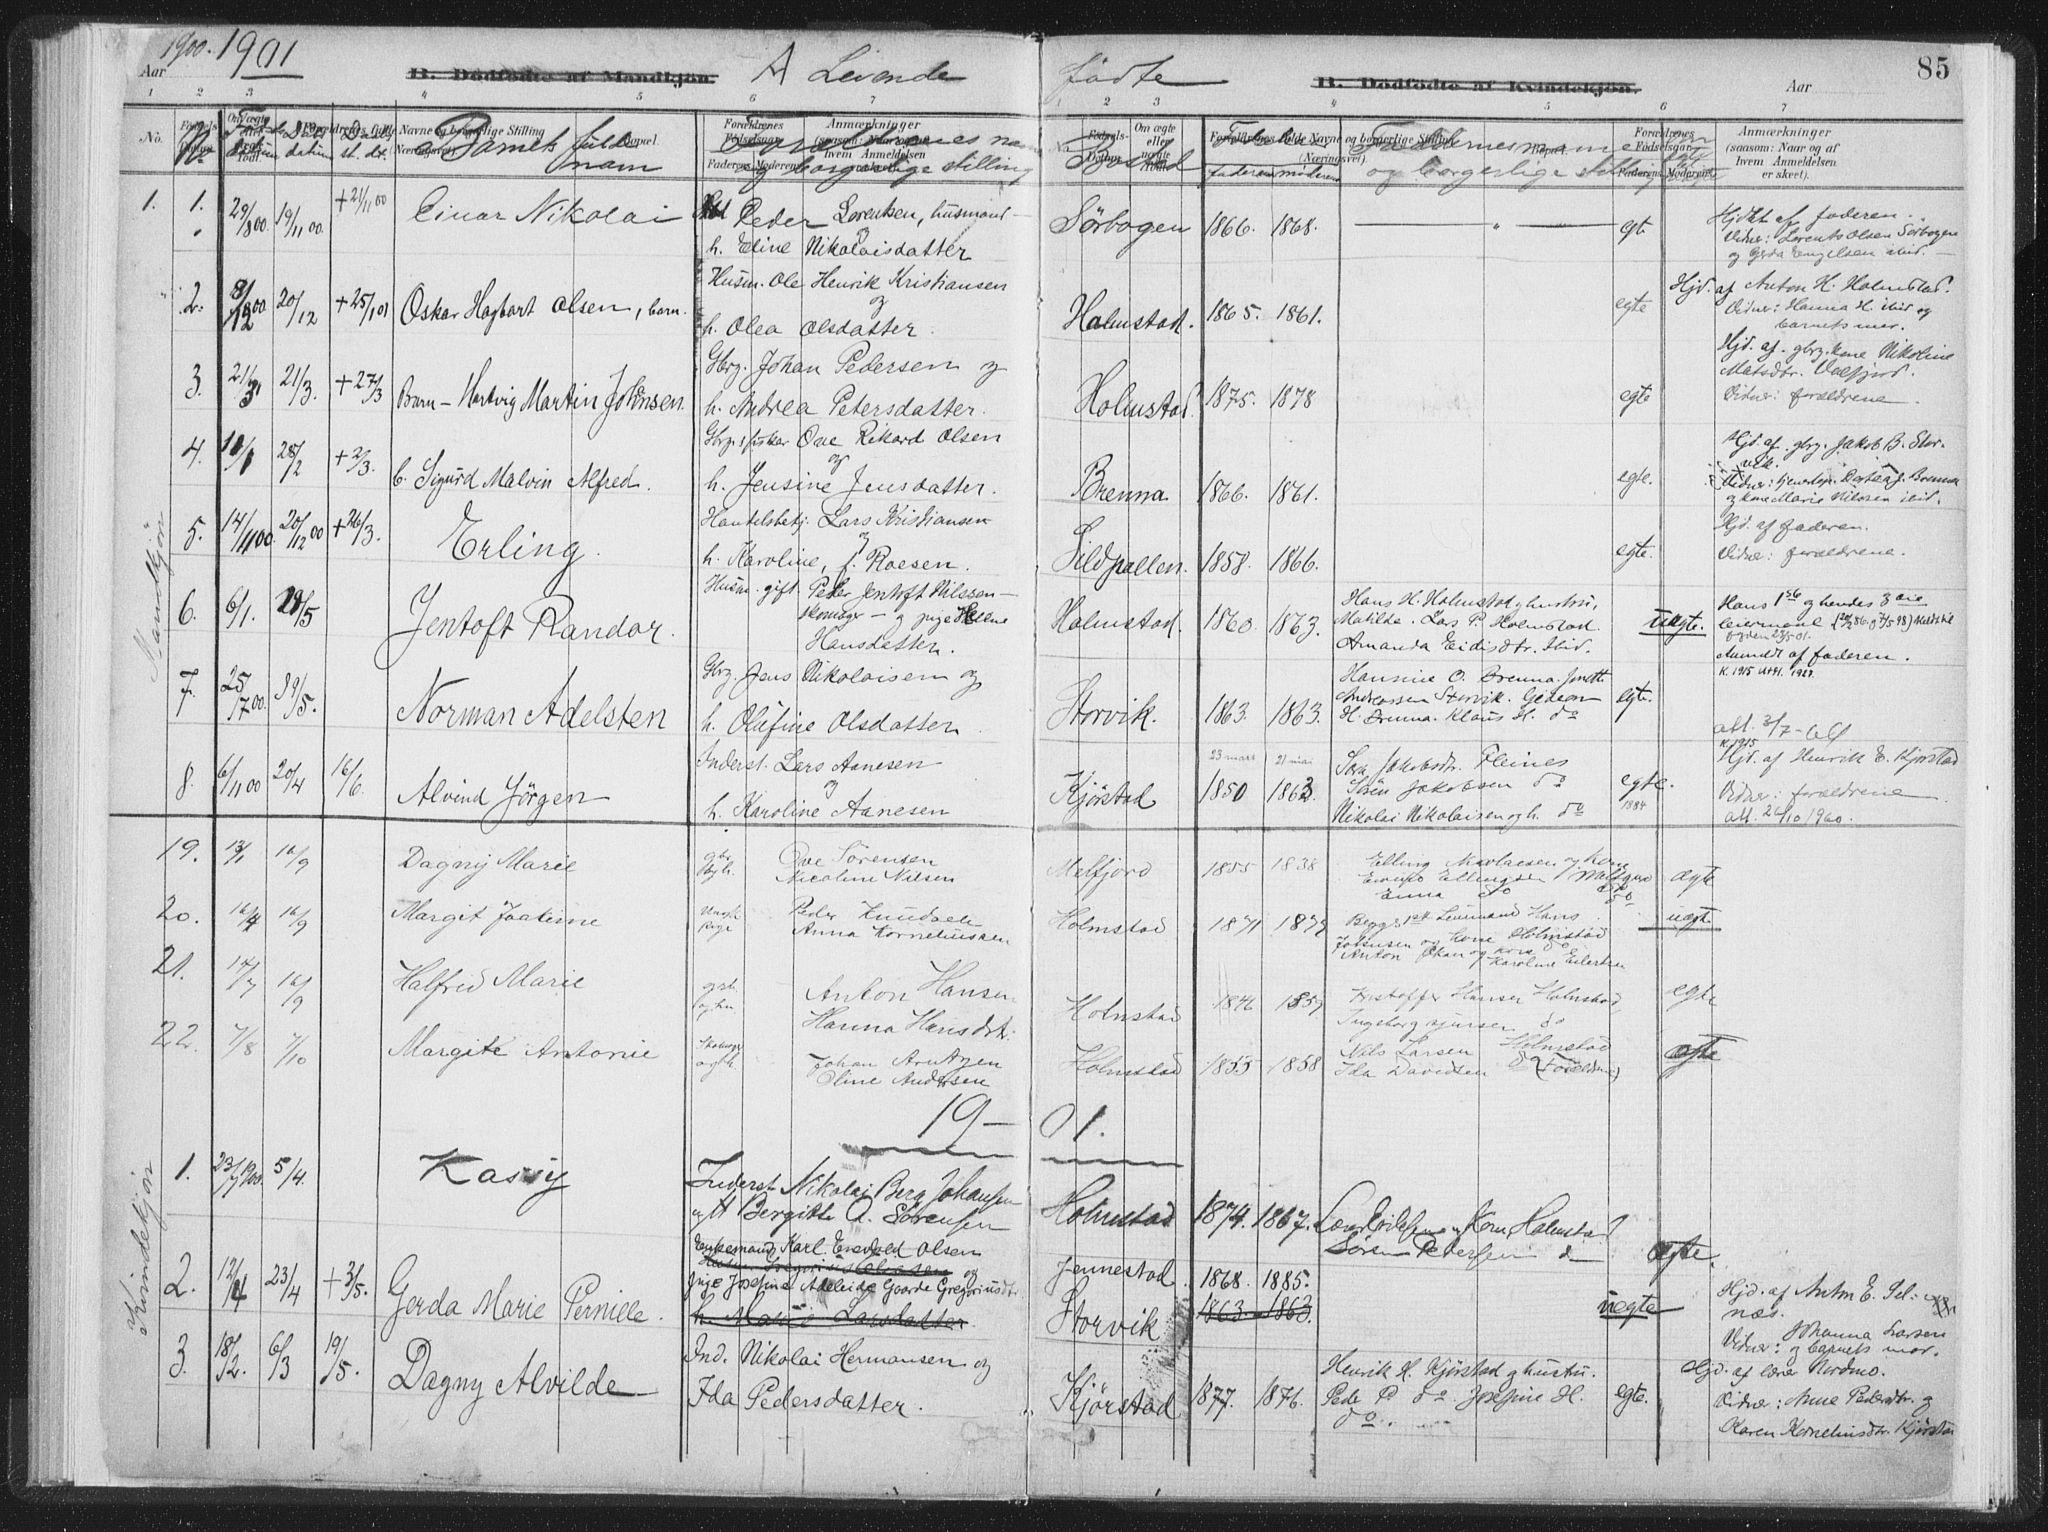 SAT, Ministerialprotokoller, klokkerbøker og fødselsregistre - Nordland, 890/L1286: Ministerialbok nr. 890A01, 1882-1902, s. 85